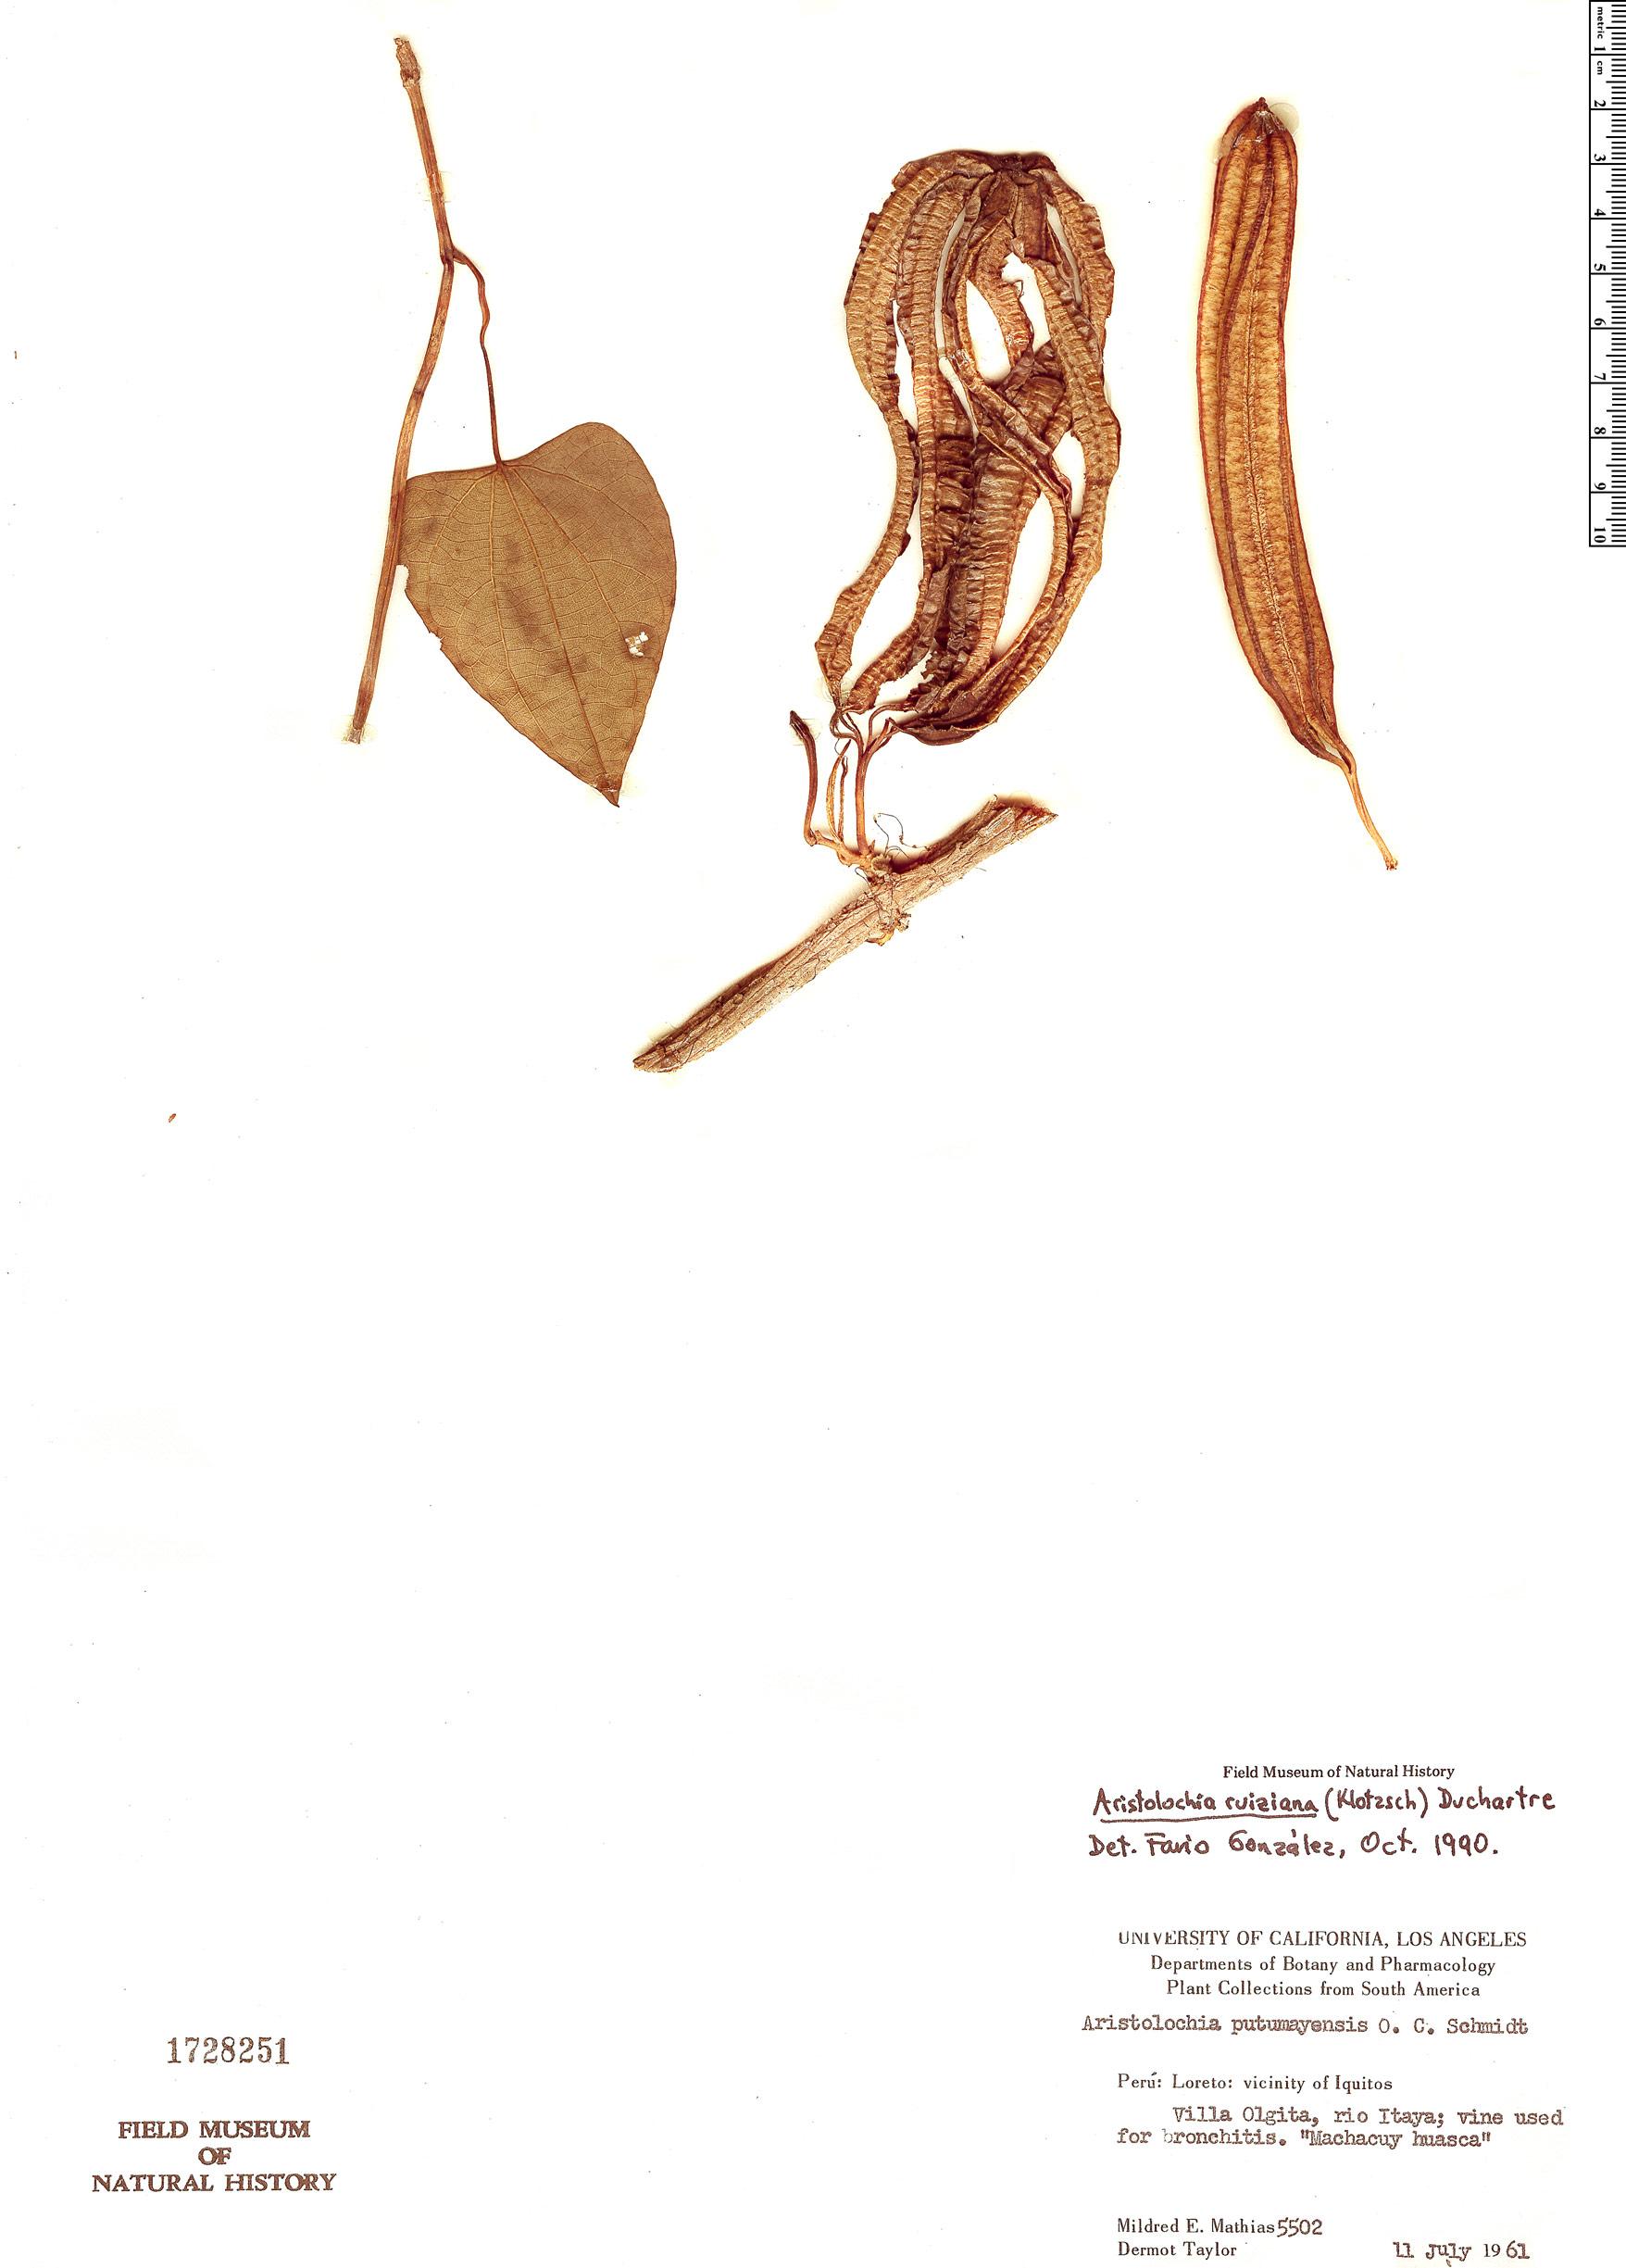 Specimen: Aristolochia ruiziana